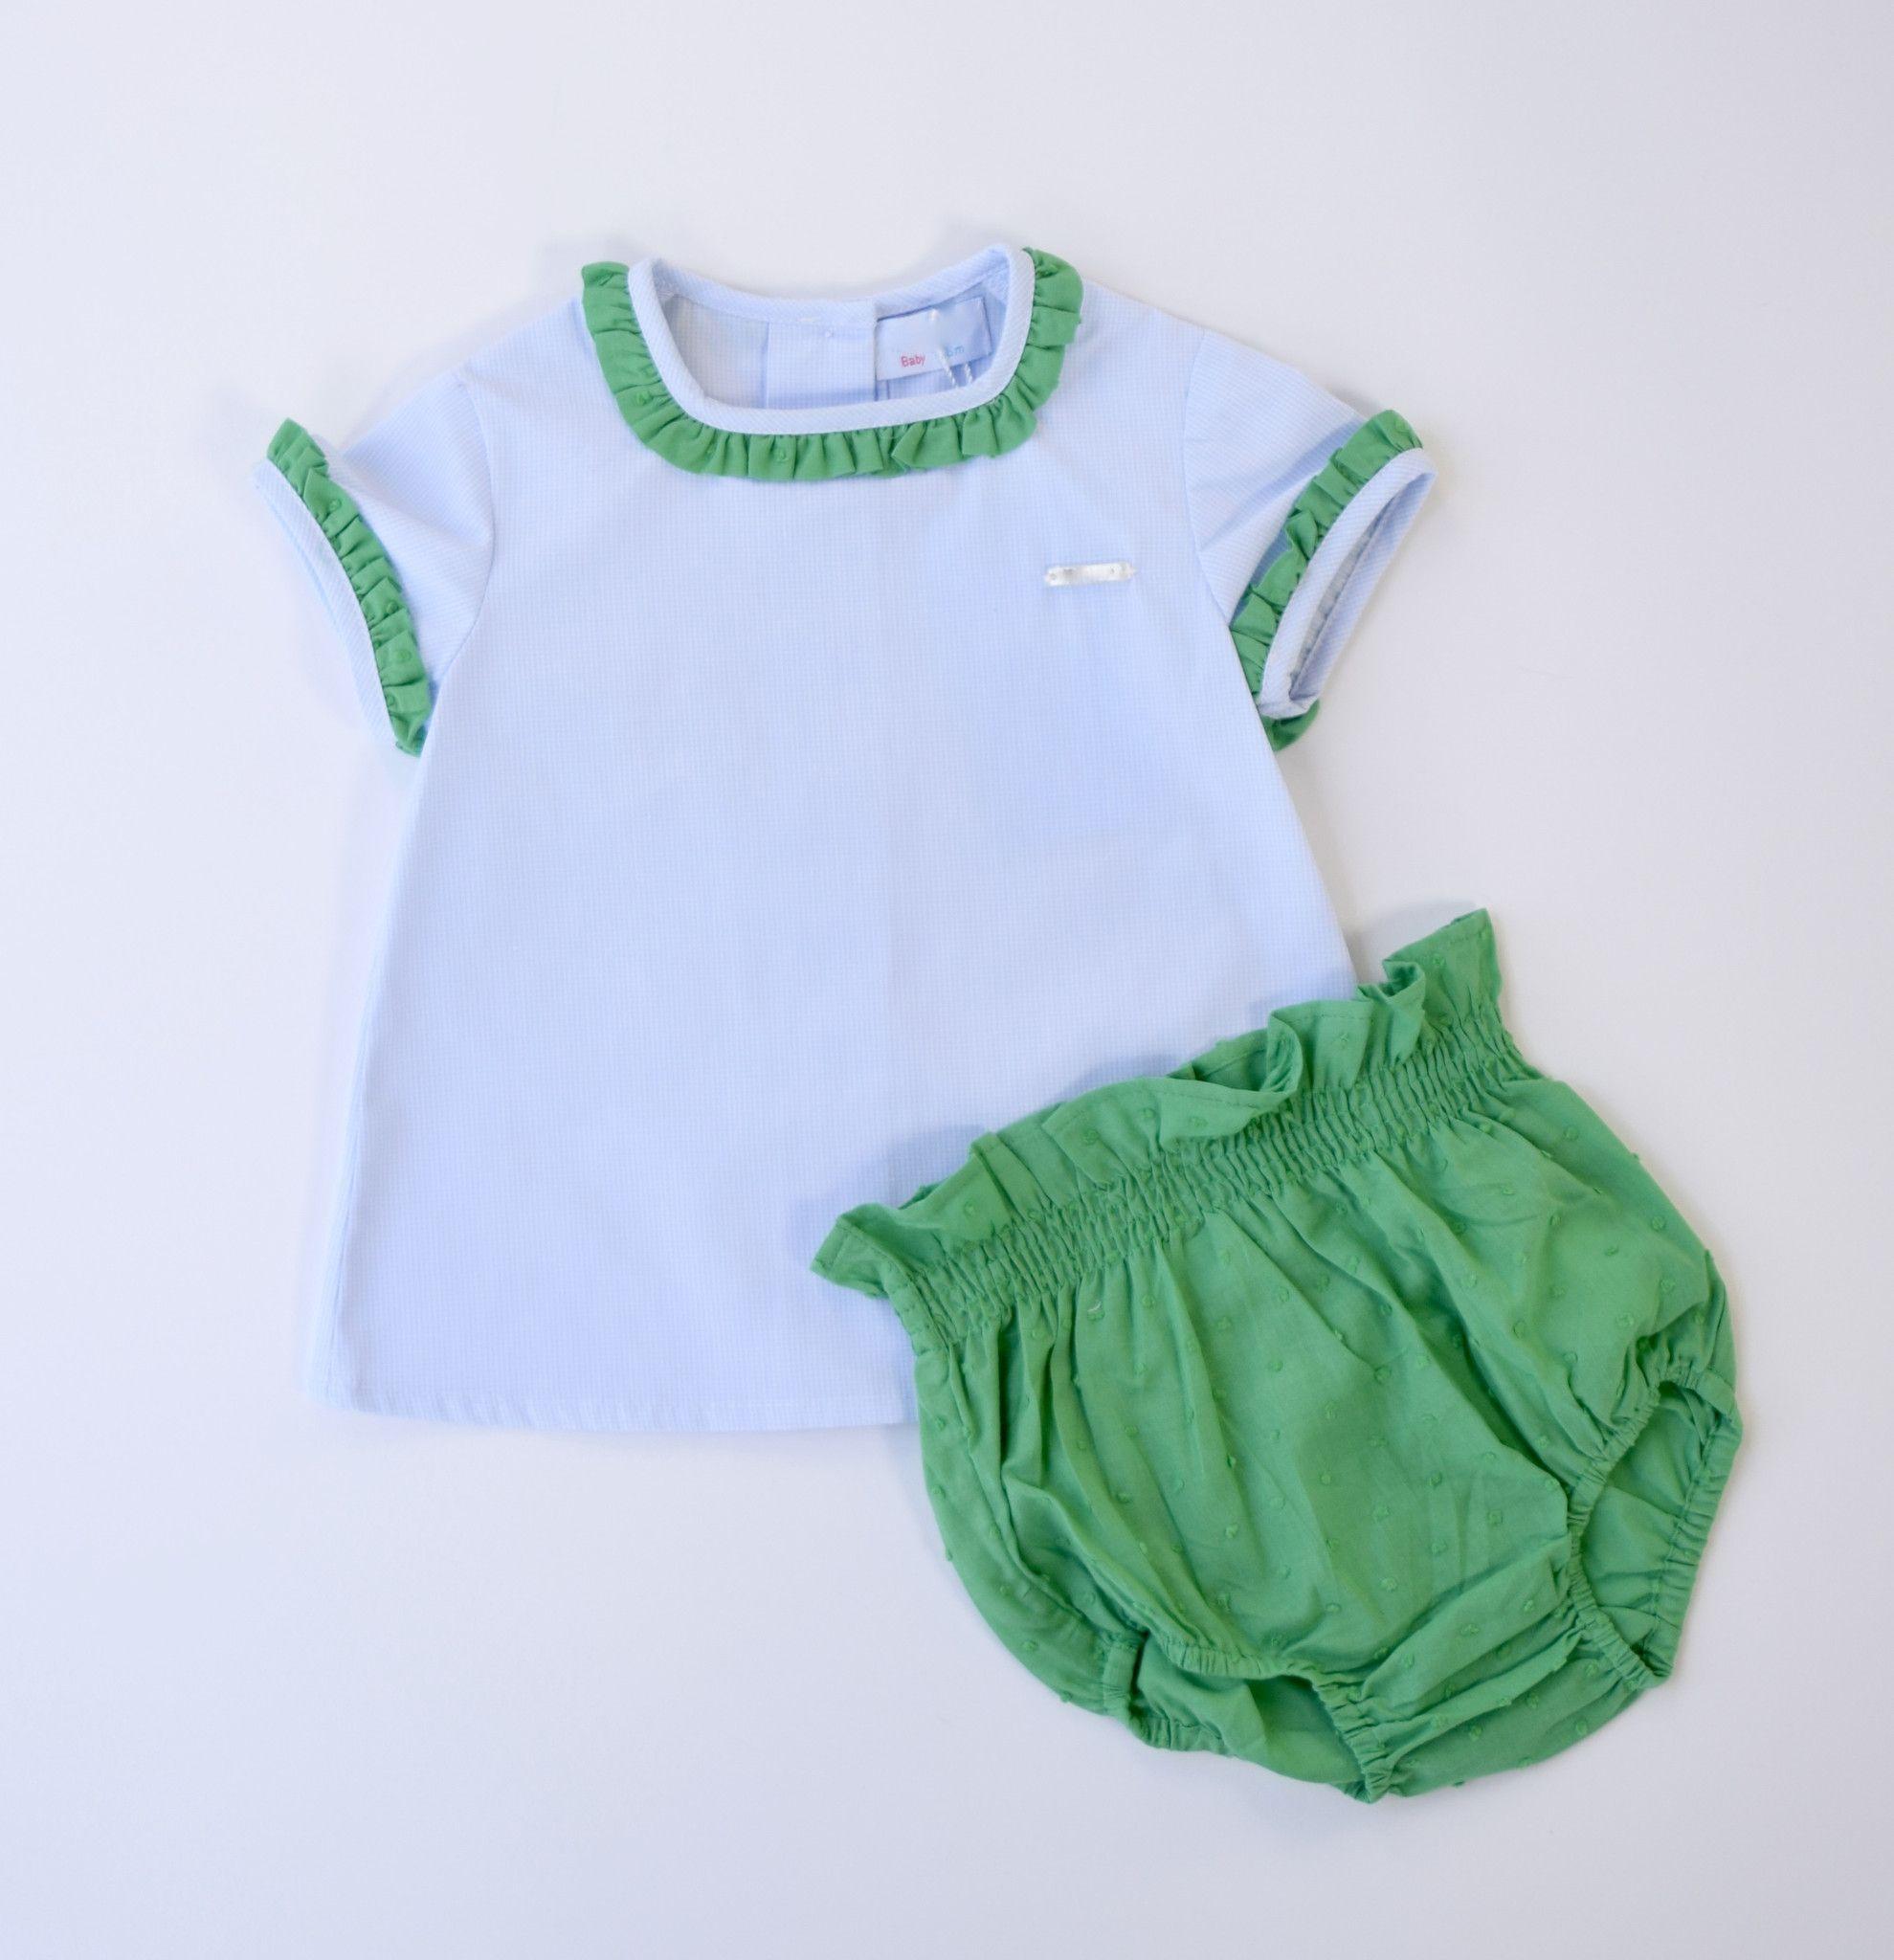 Blue & Green Baby Set